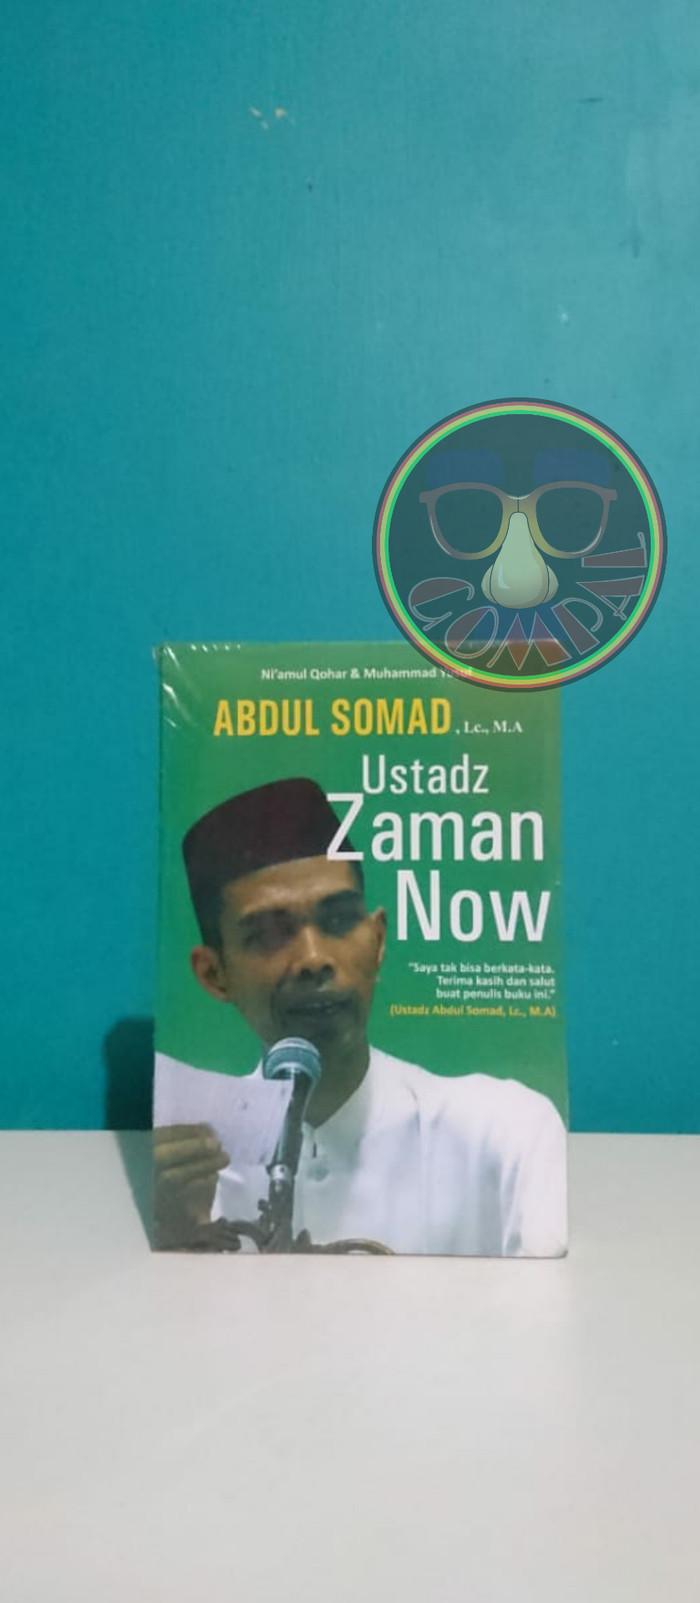 Jual Ustad Zaman Now Ust Abdul Somad Lc Jakarta Pusat Gompal Punya